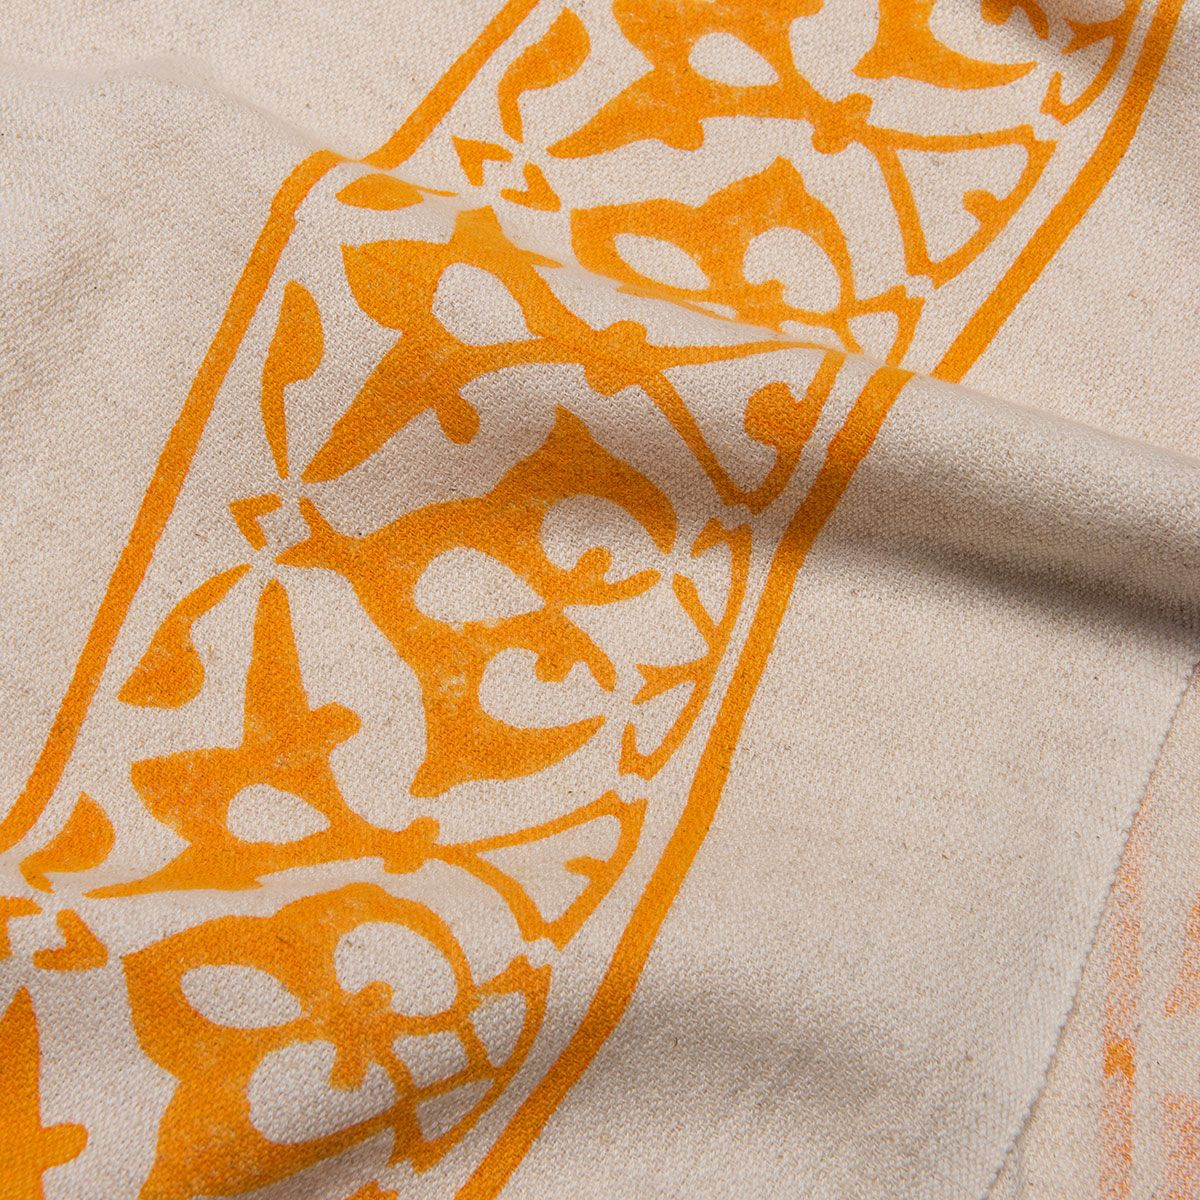 Peshtemal Hand printed 03 - Orange